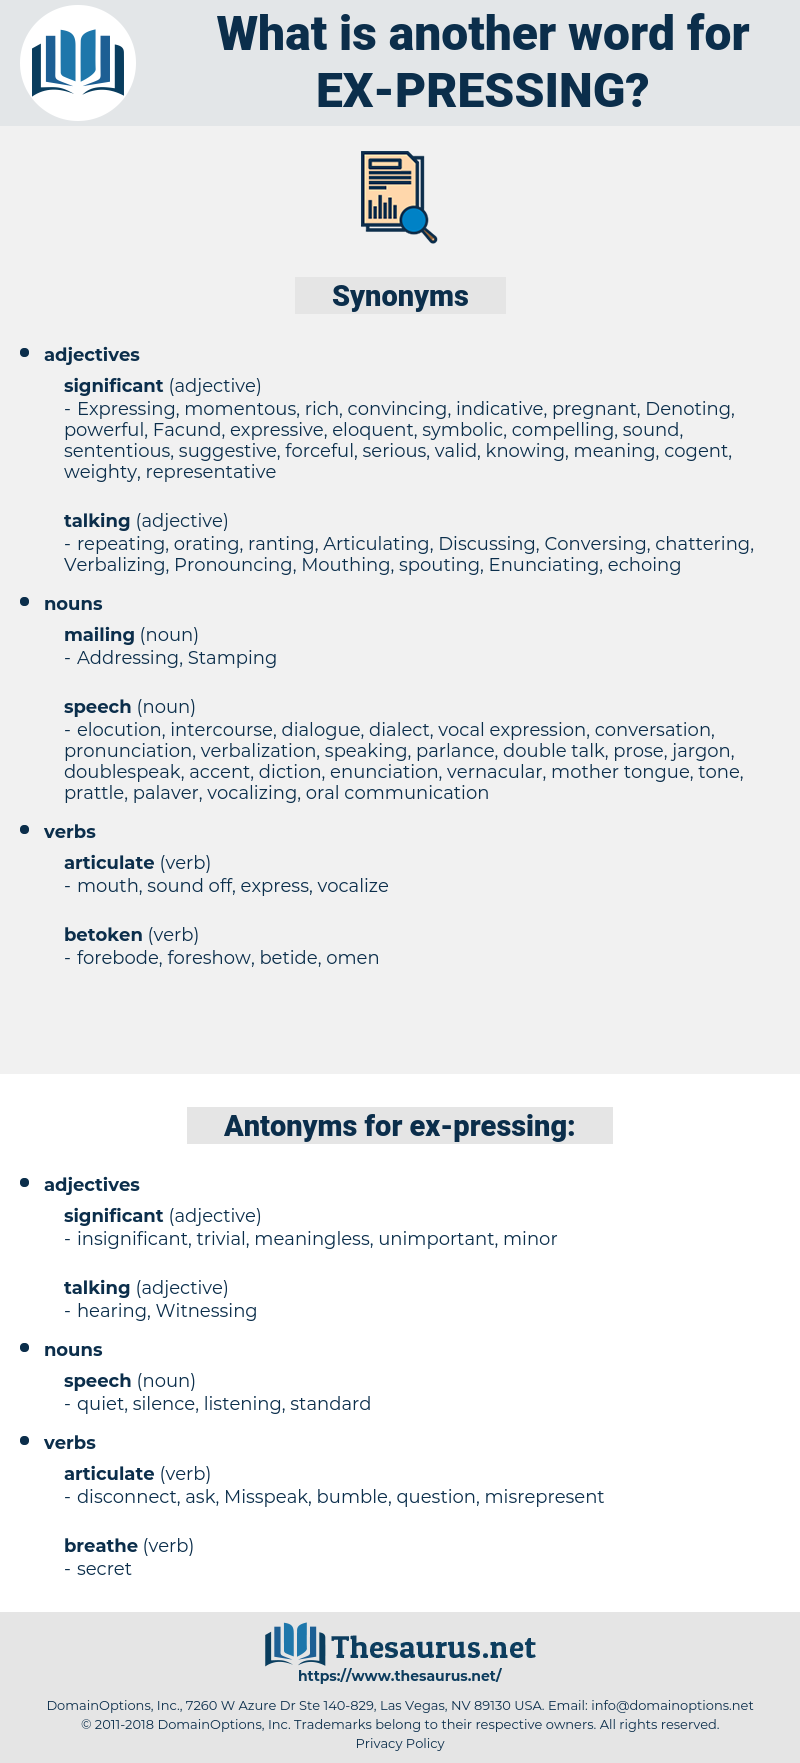 ex-pressing, synonym ex-pressing, another word for ex-pressing, words like ex-pressing, thesaurus ex-pressing